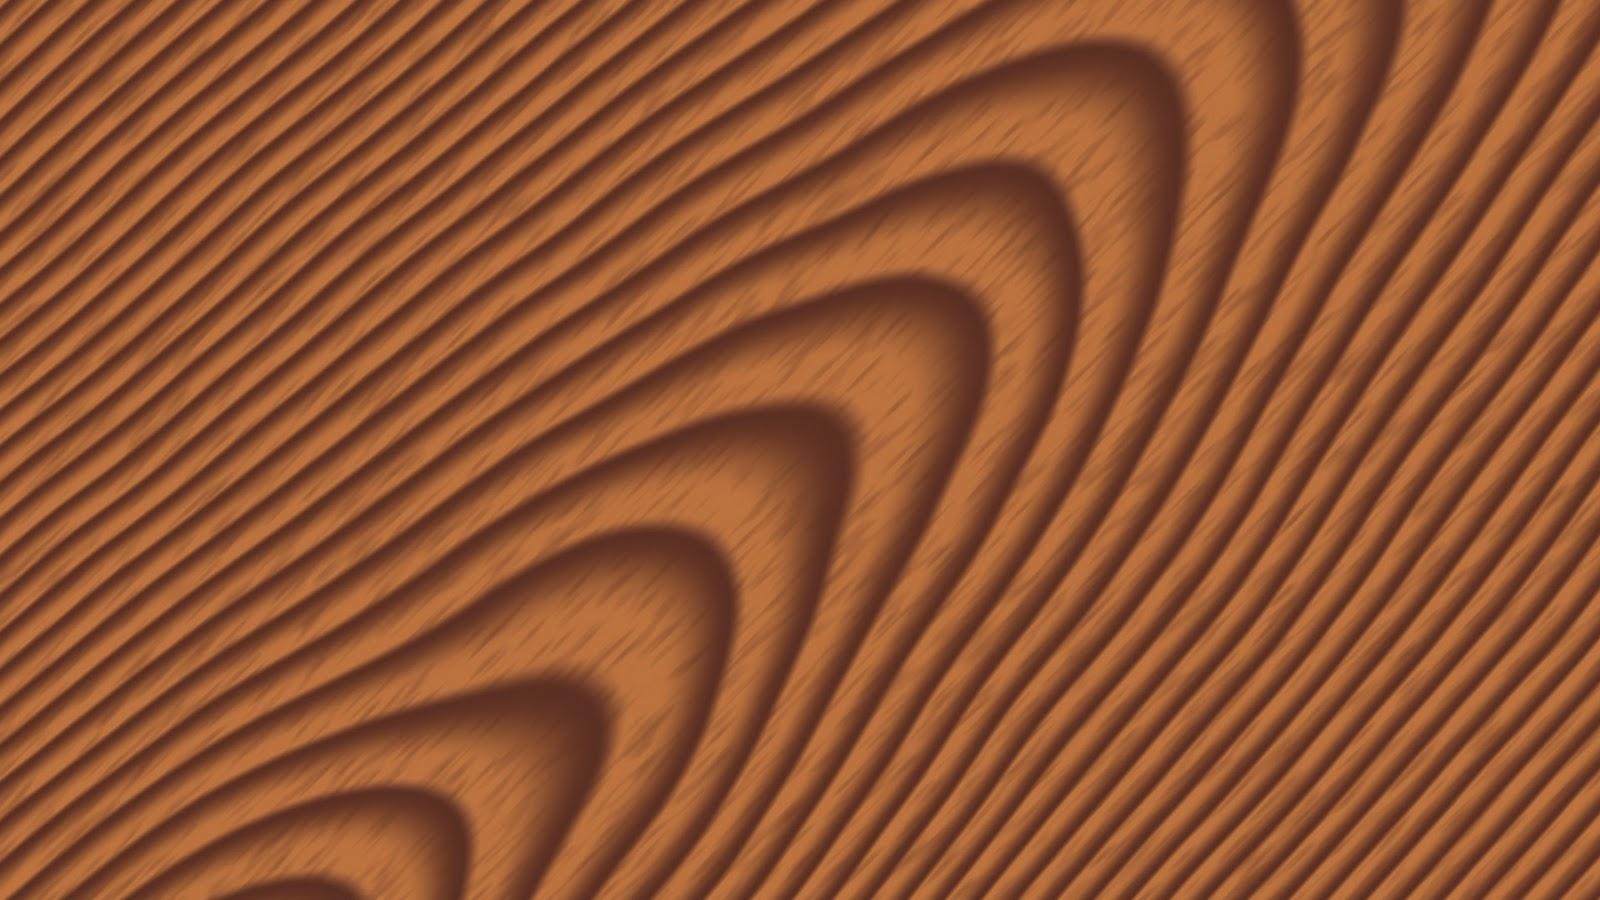 Hd wallpaper wood - Hd Wallpaper Wood